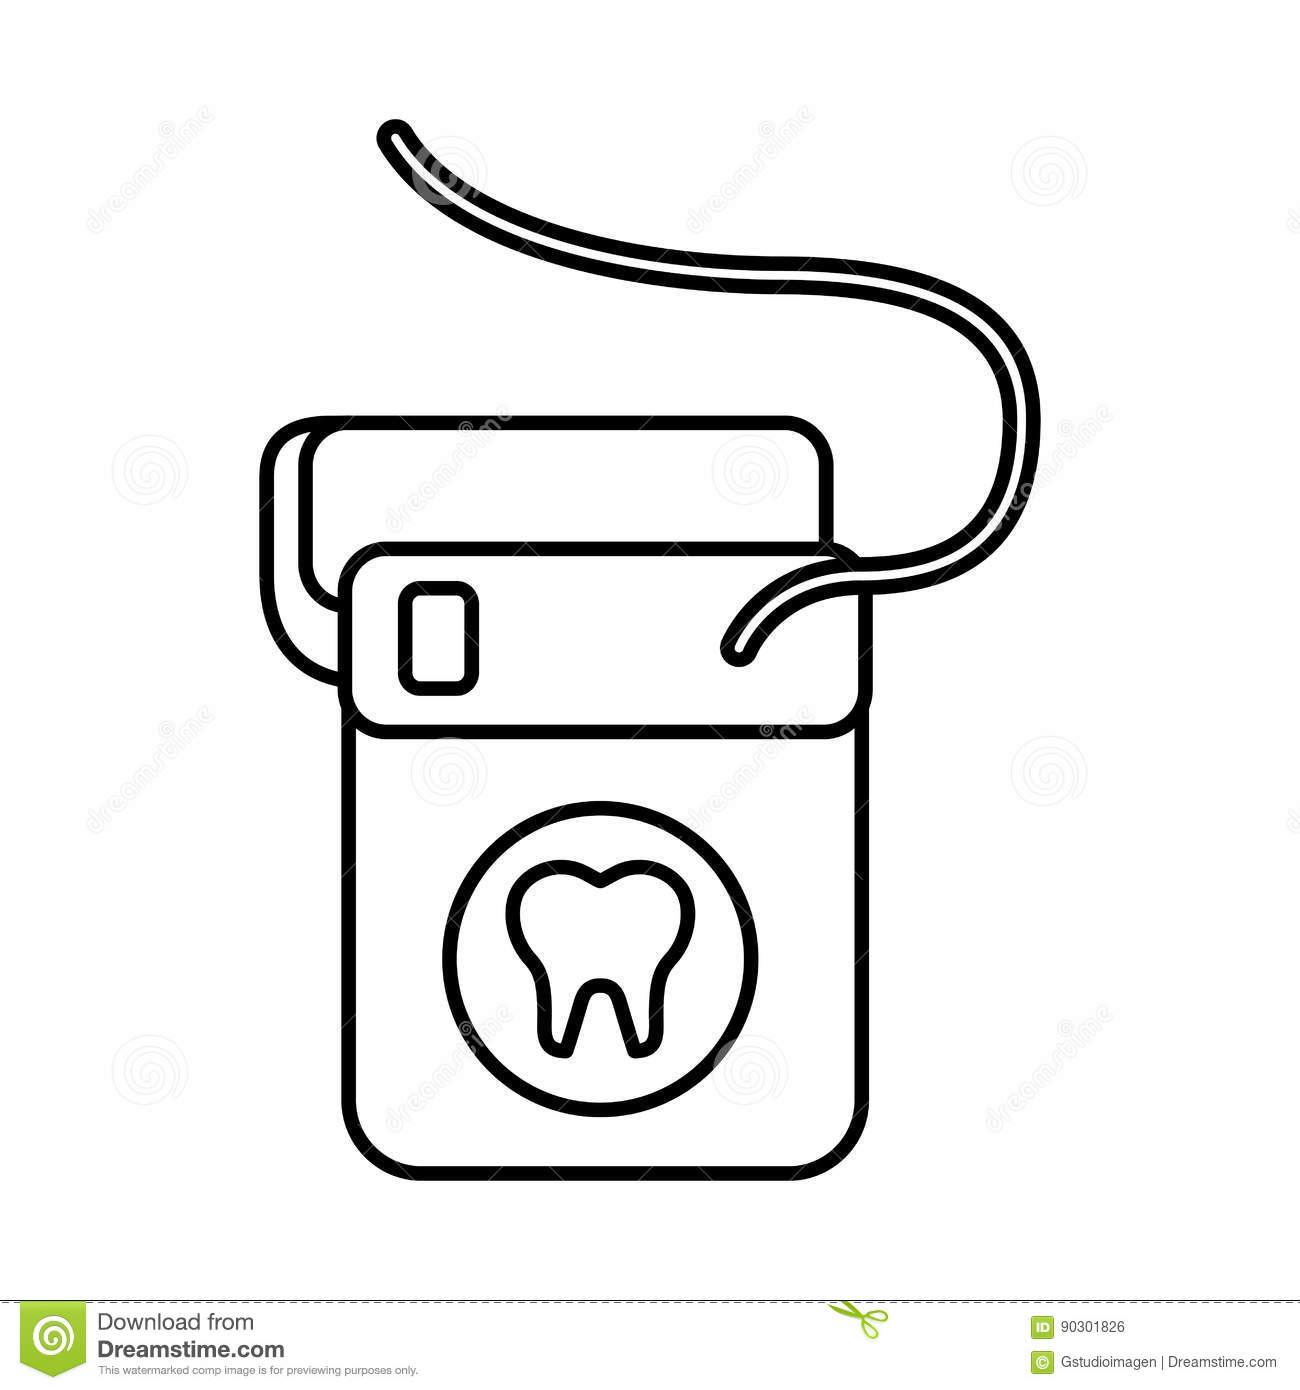 Dental floss icon stock vector. Illustration of health.